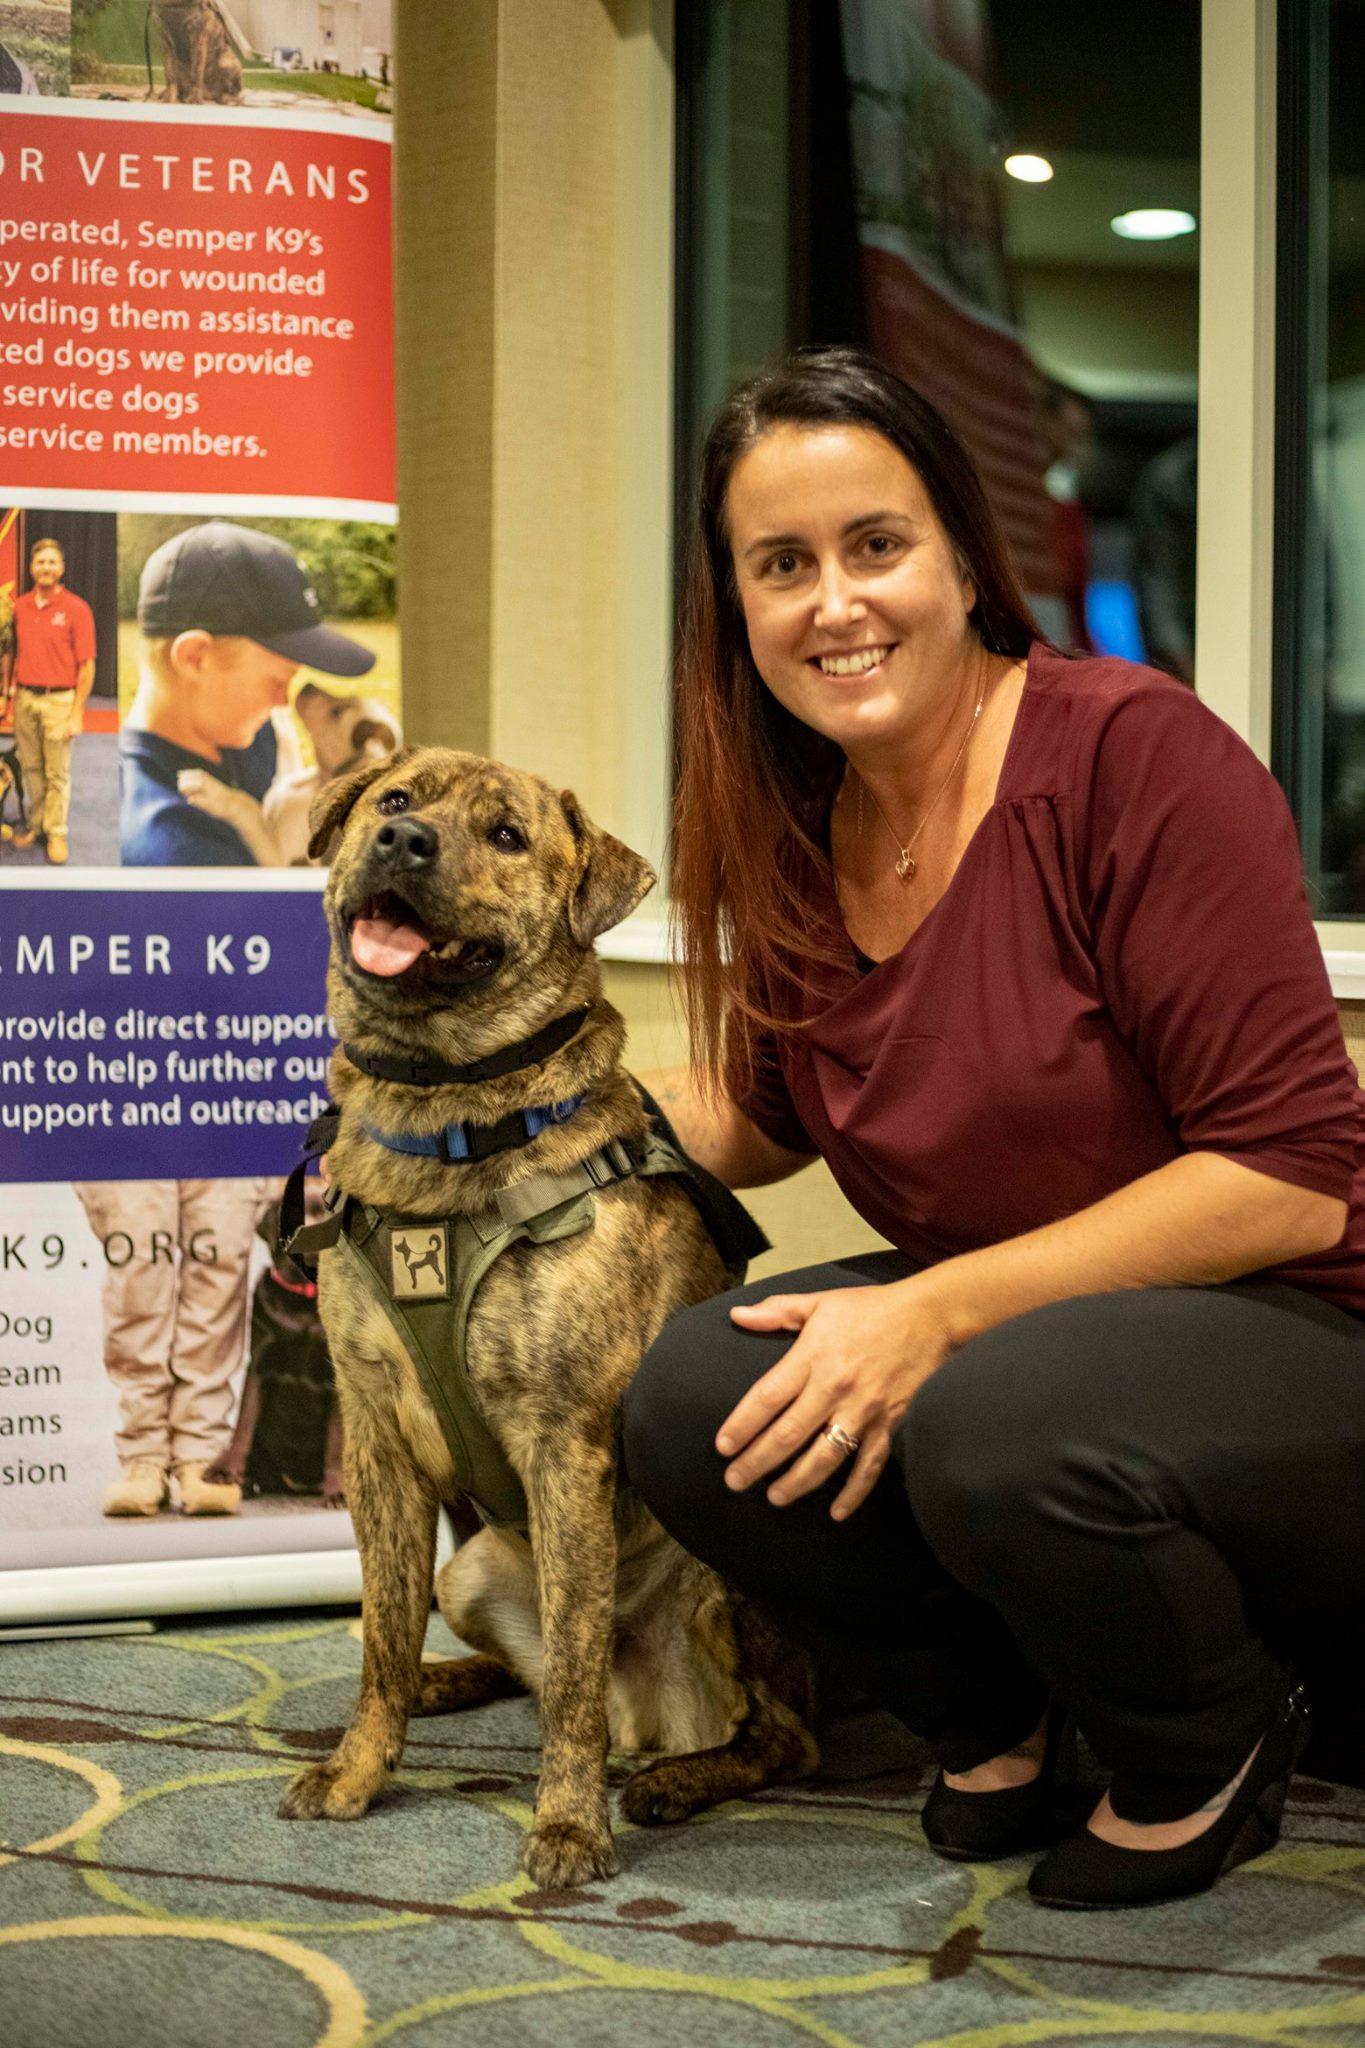 Name A Service Dog - Semper K9 - Service Dogs for Veterans